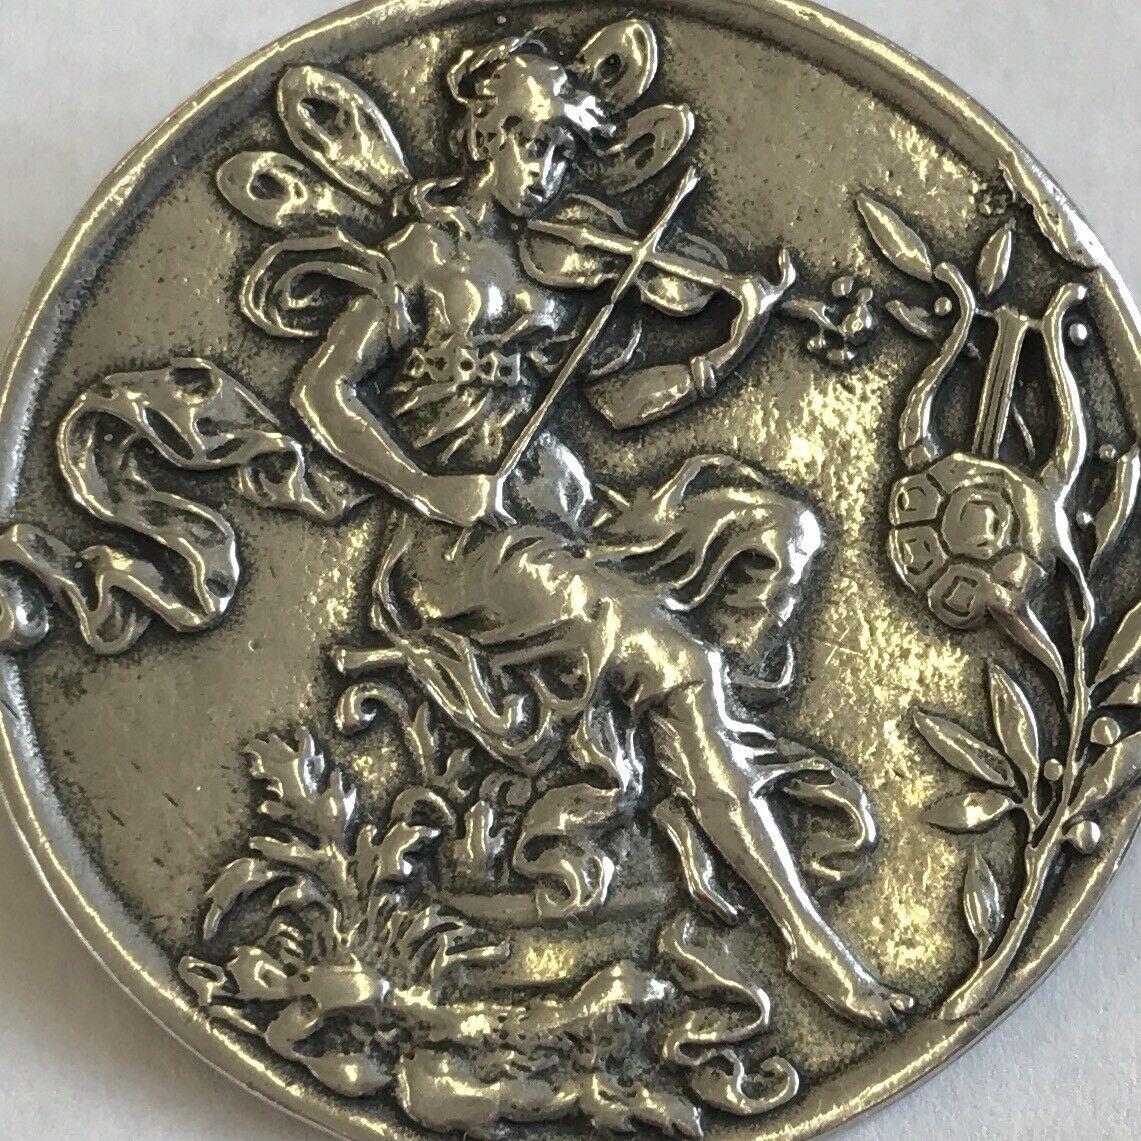 VINTAGE IN argentoO ARI D Norman Art Nouveau Fantasy Fantasy Fantasy Musicale Spilla 3.5 cm 691050